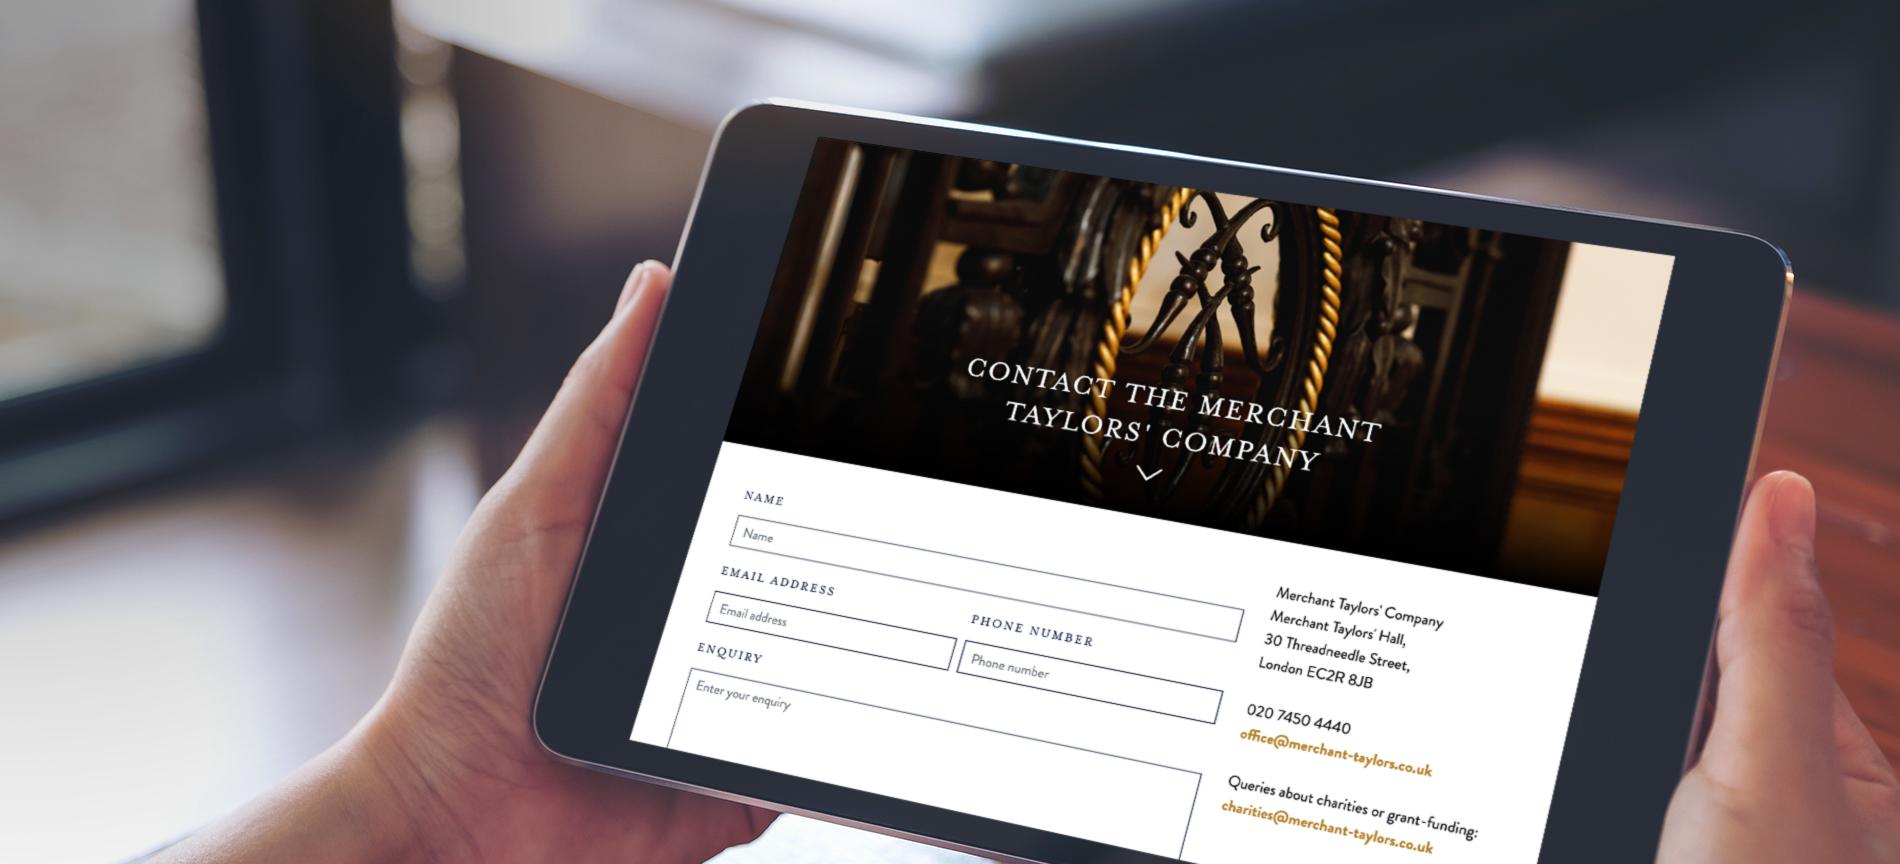 Merchant Taylors' Company Contact webpage on an iPad - desktop